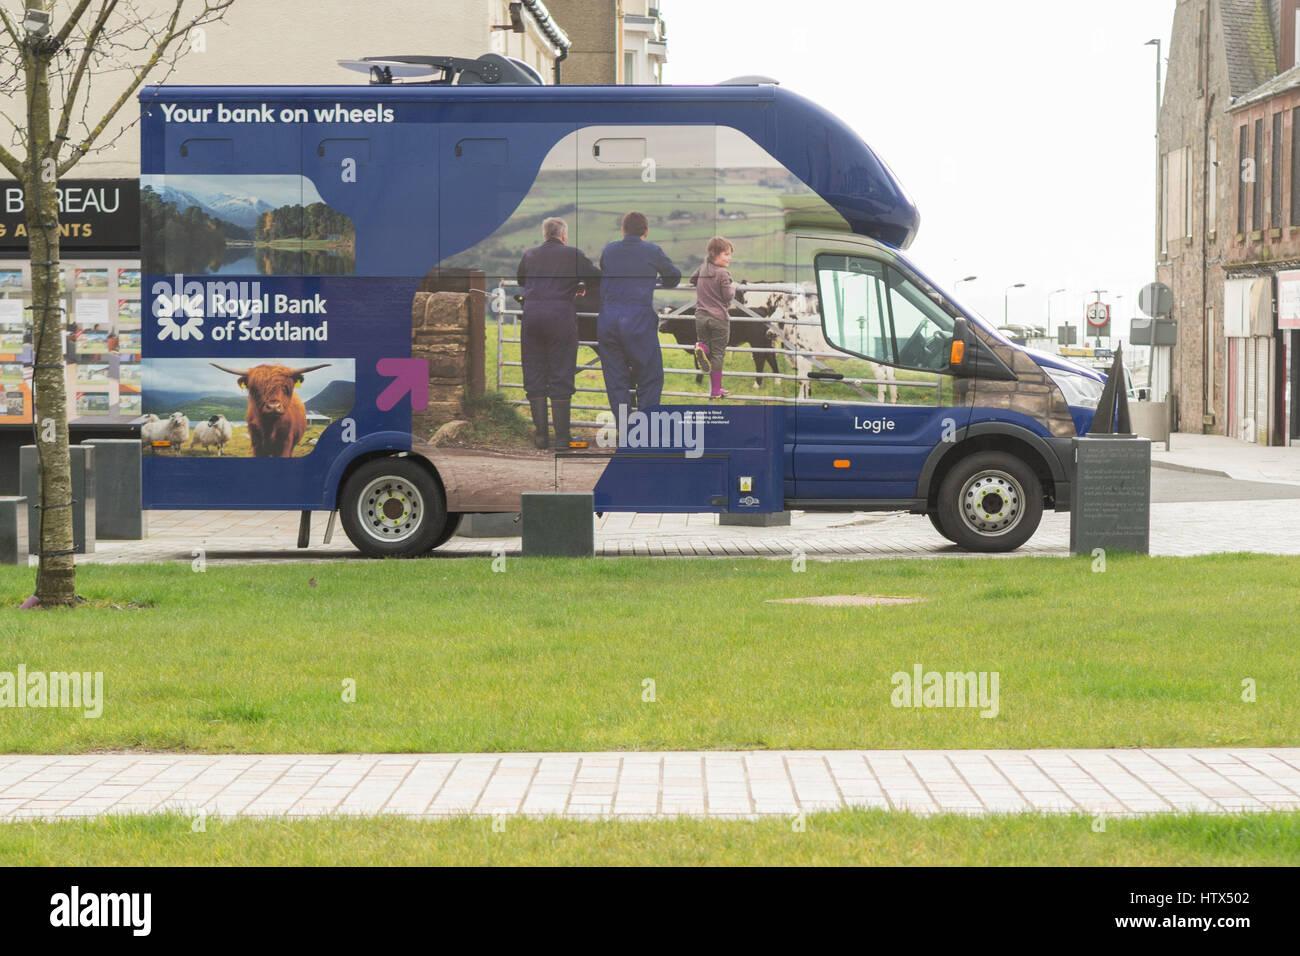 Royal Bank of Scotland RBS van mobile Photo Stock